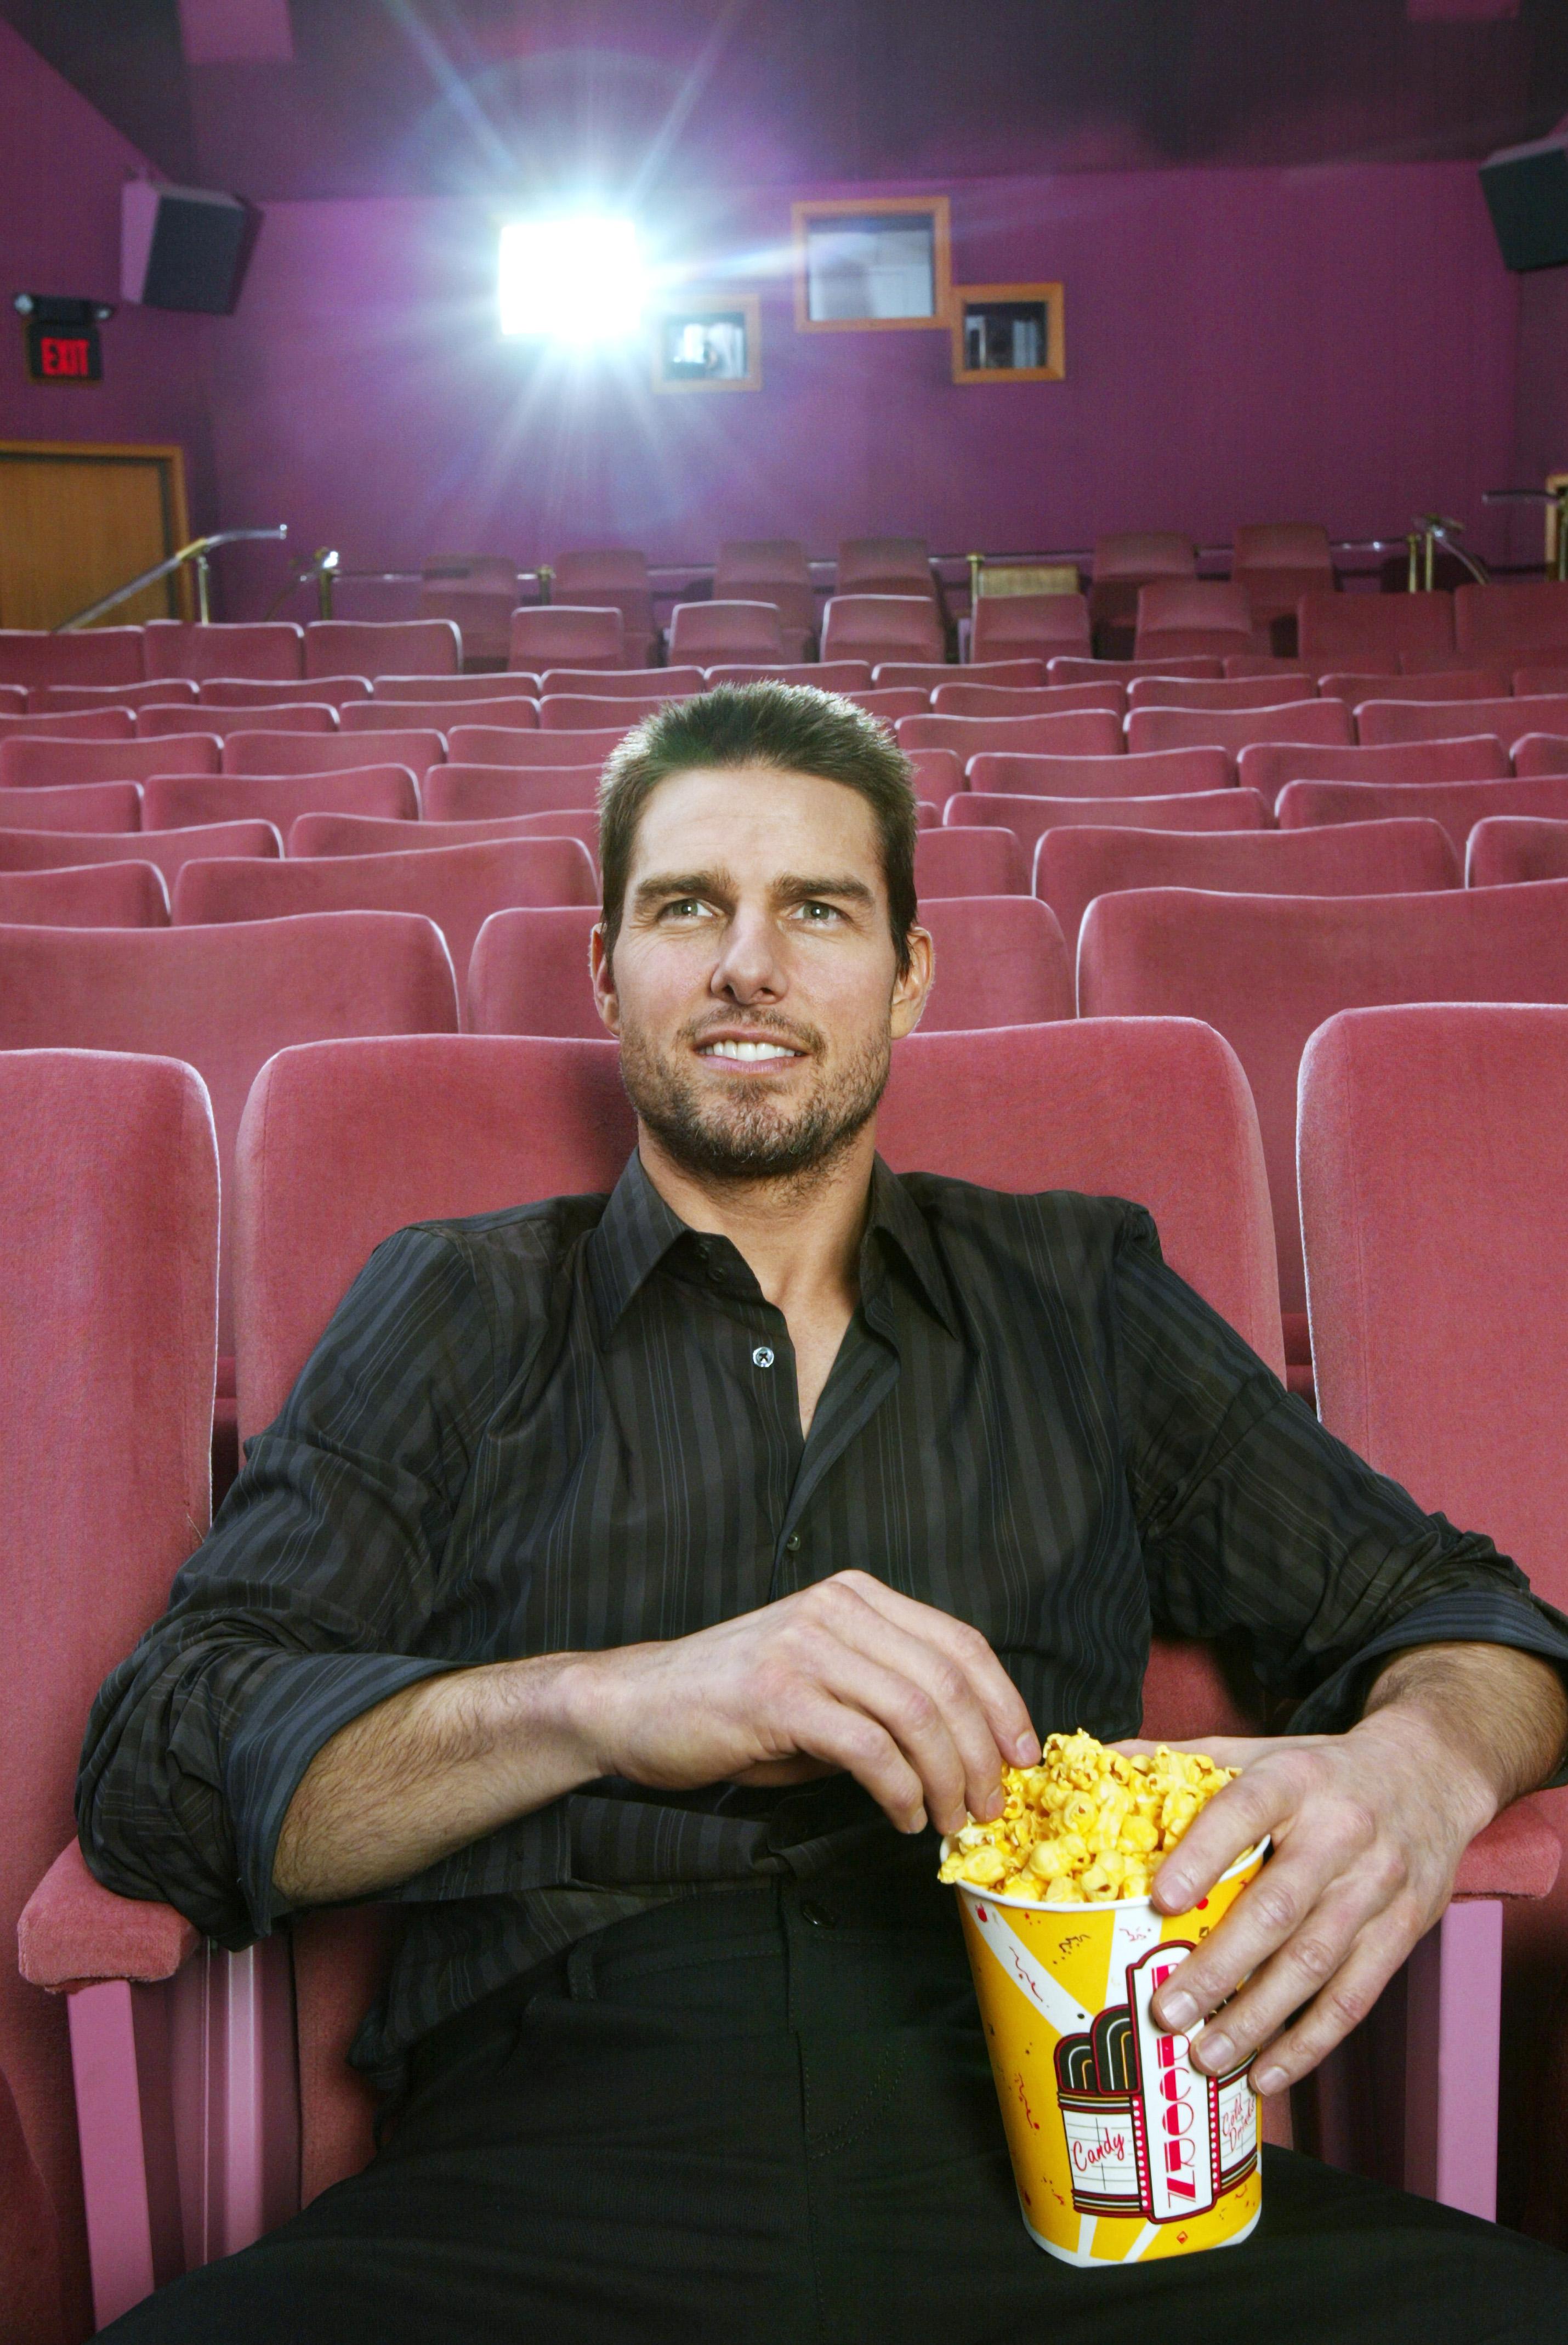 Tom Cruise Usa Today November 18 2003 Hq